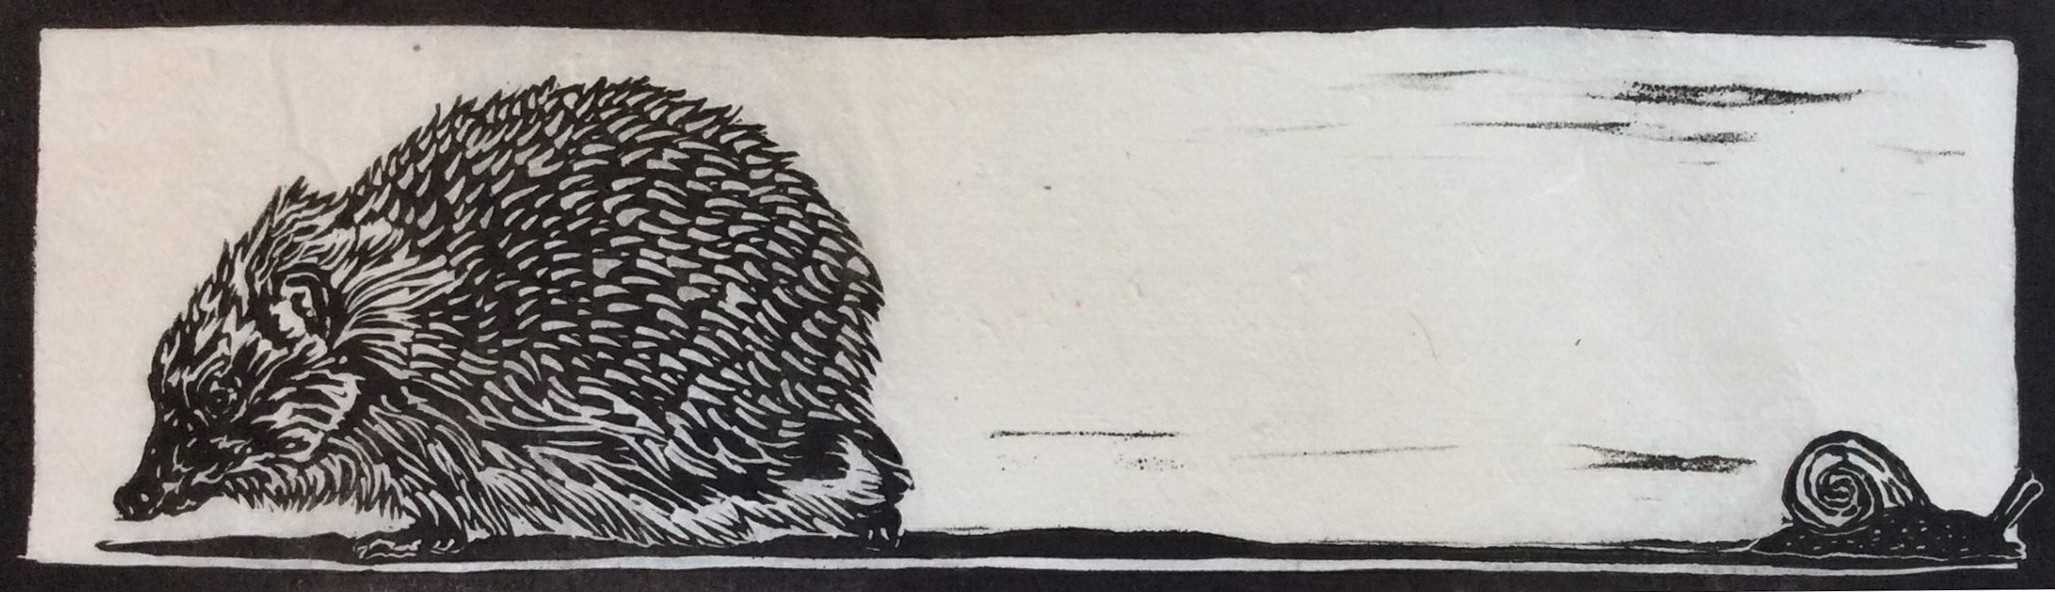 sarah-cemmick-hedgehog-linocut-print